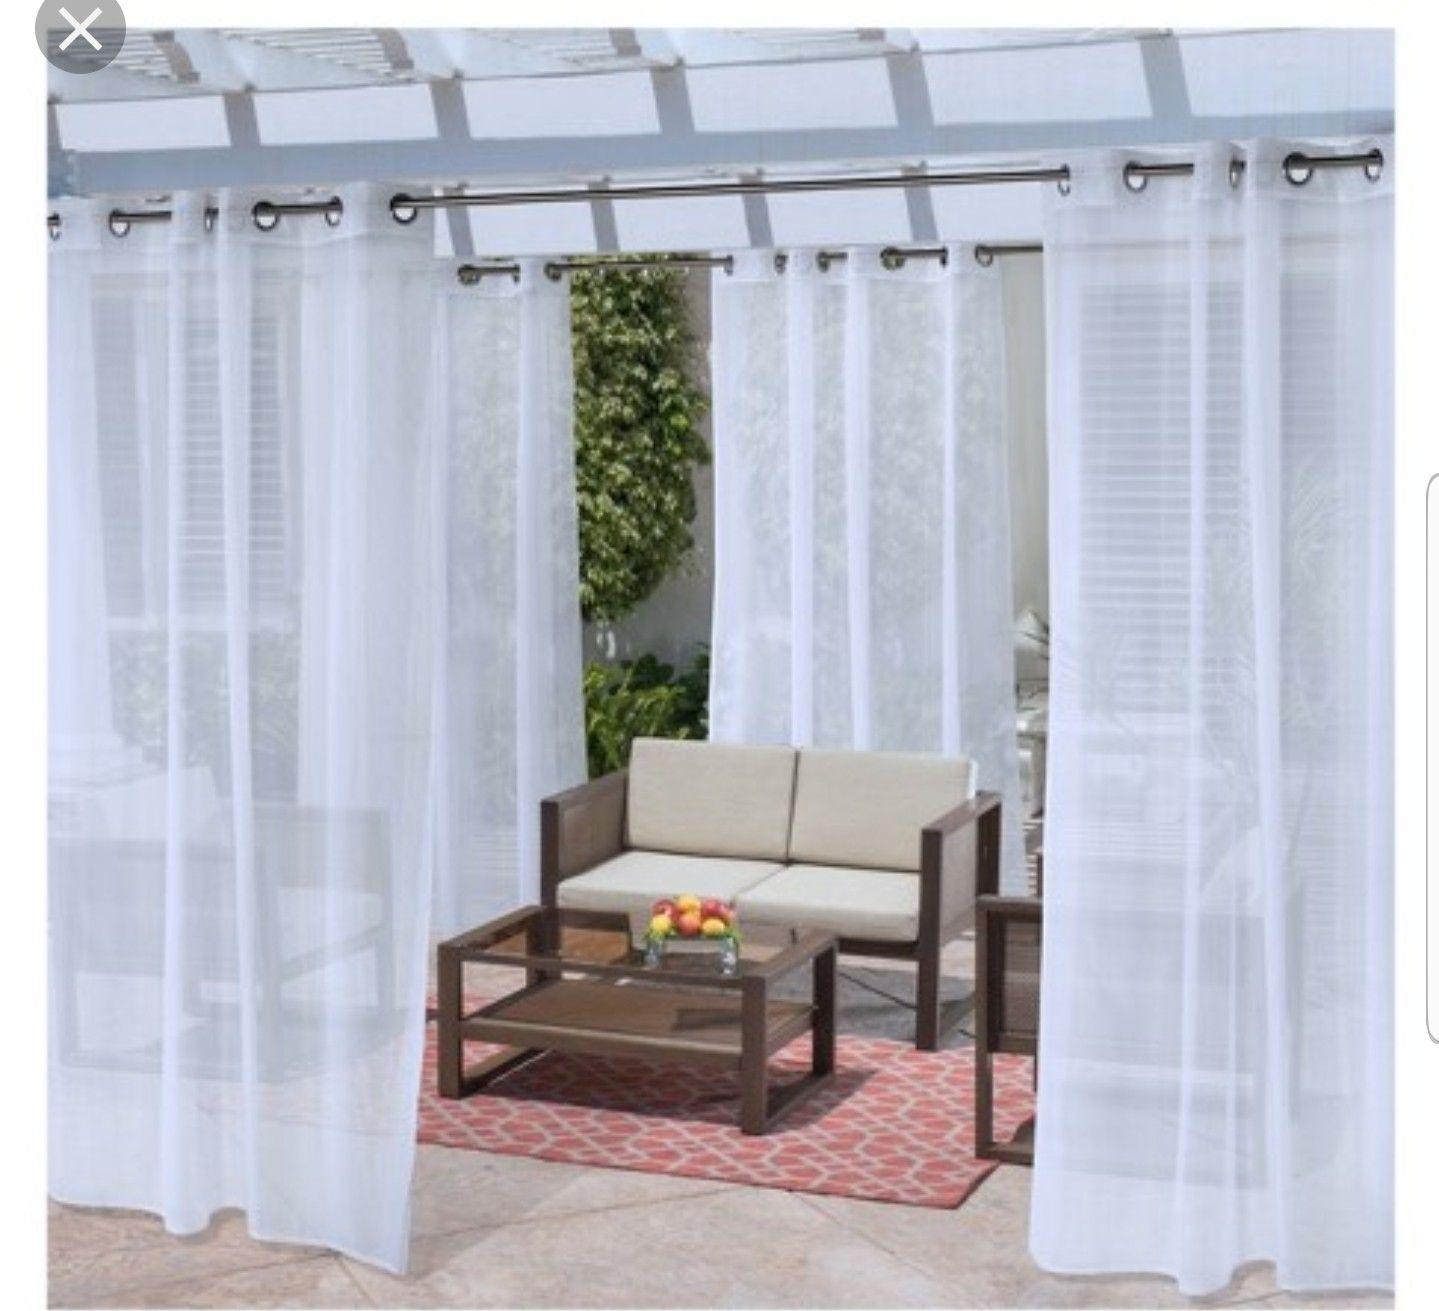 Screen alternative Outdoor curtain panels, Outdoor